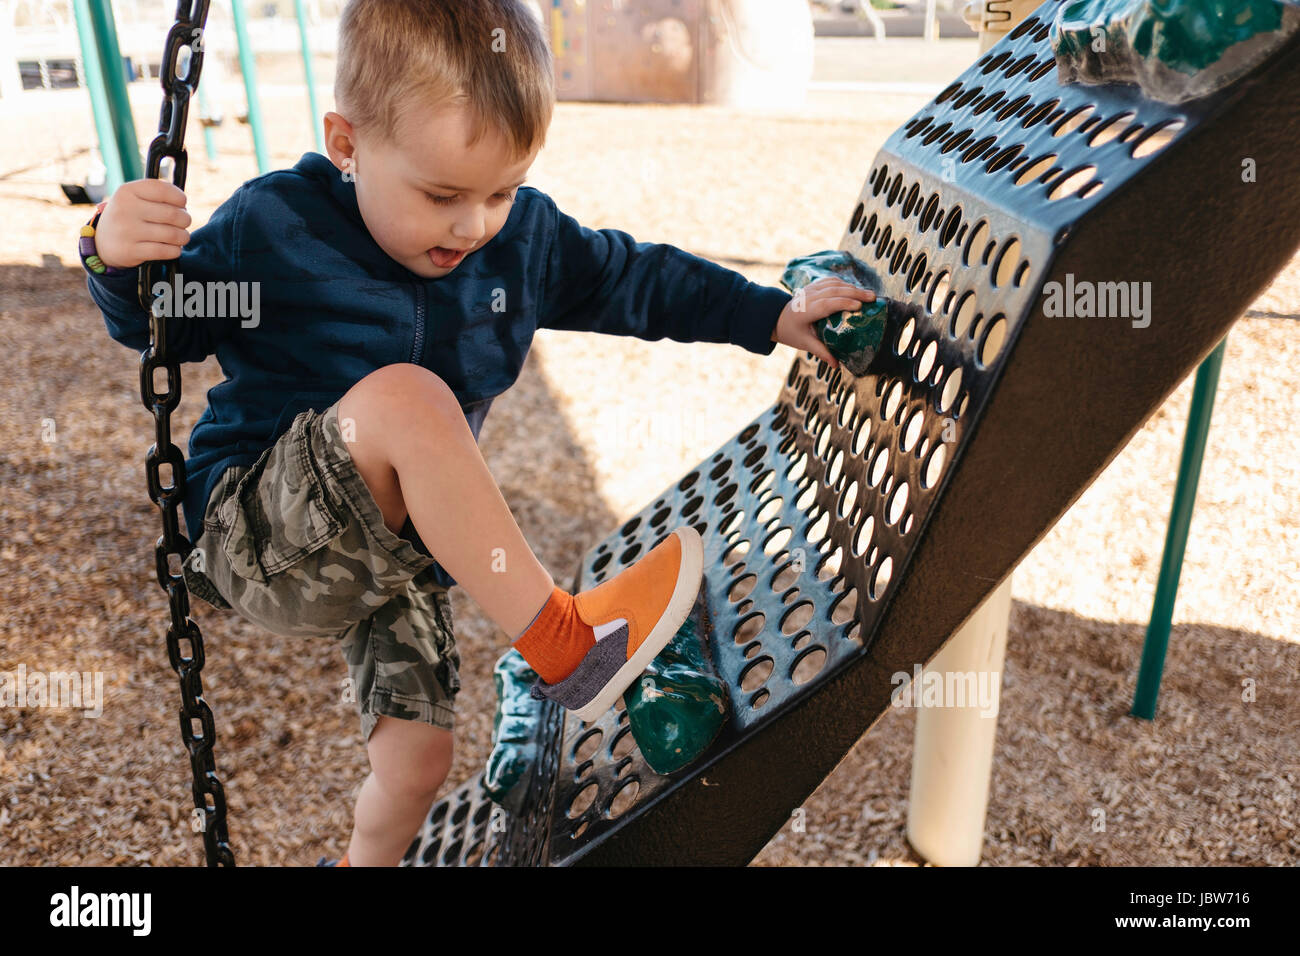 Boy climbing on playground climbing frame - Stock Image